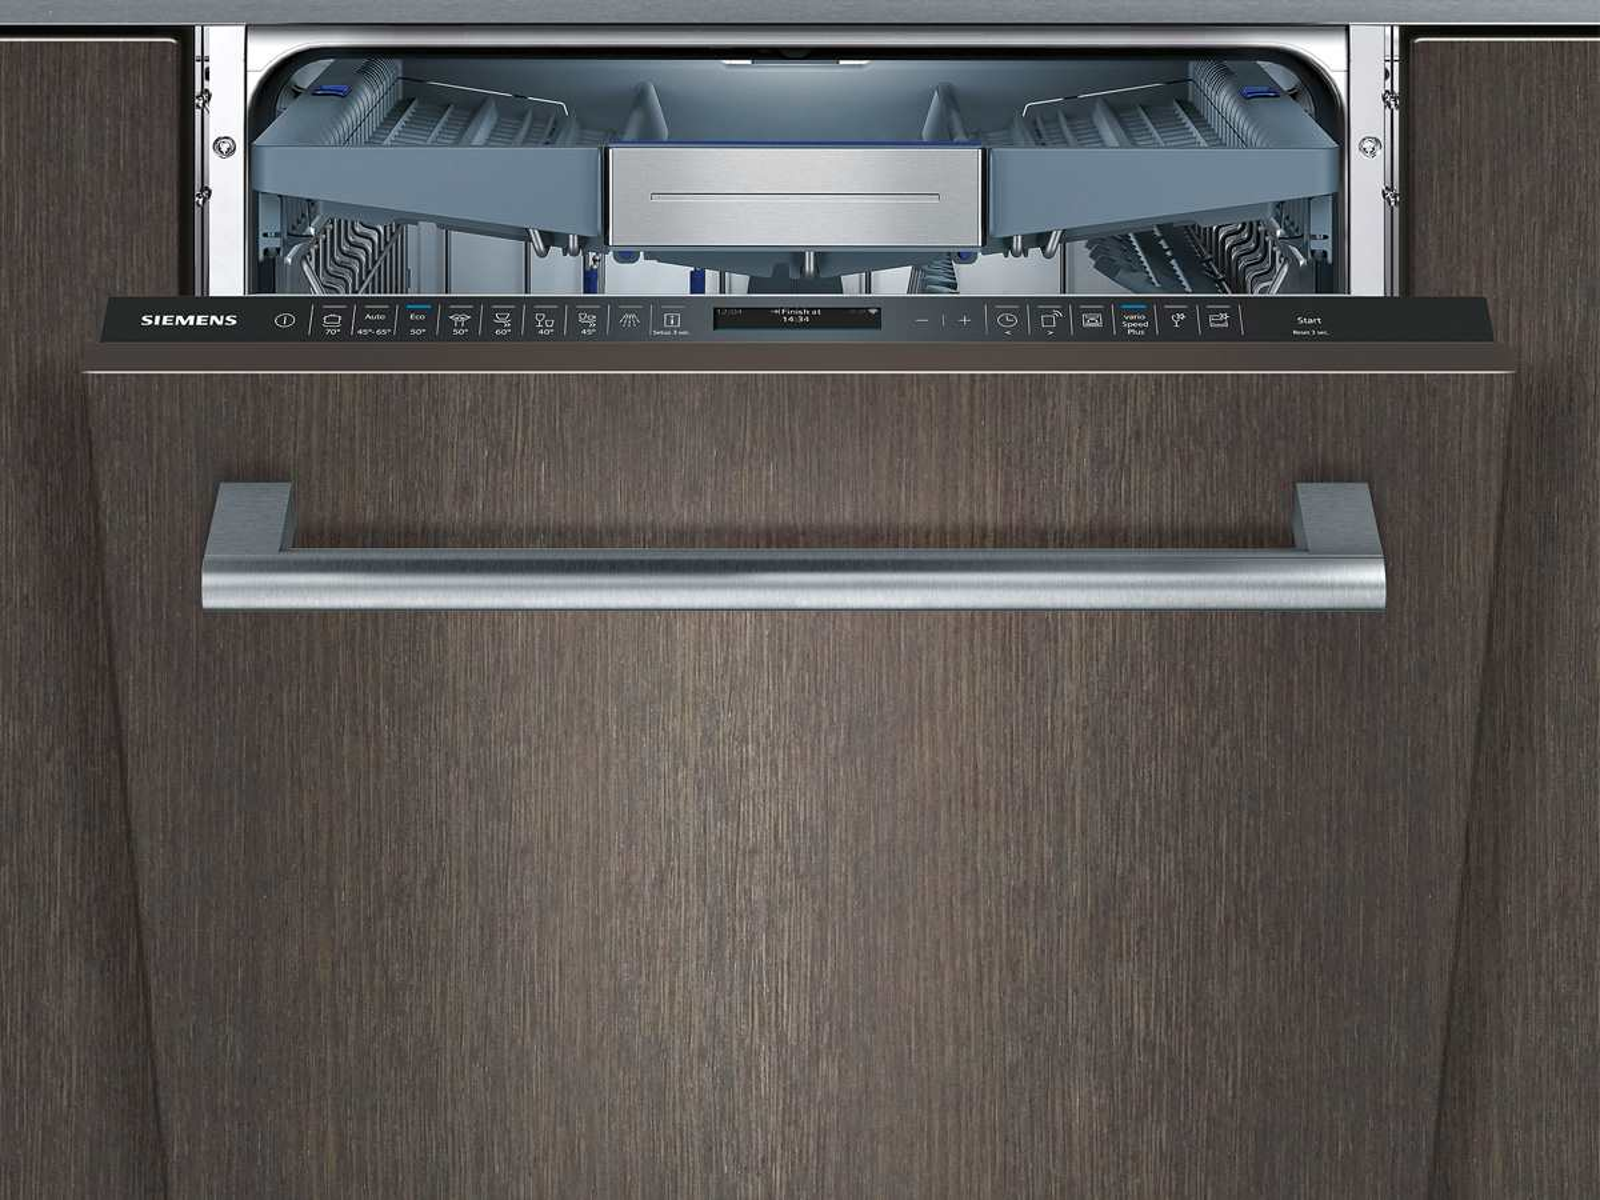 Siemens Kühlschrank Xxl : Siemens sx te vollintegrierbarer einbaugeschirrspüler xxl